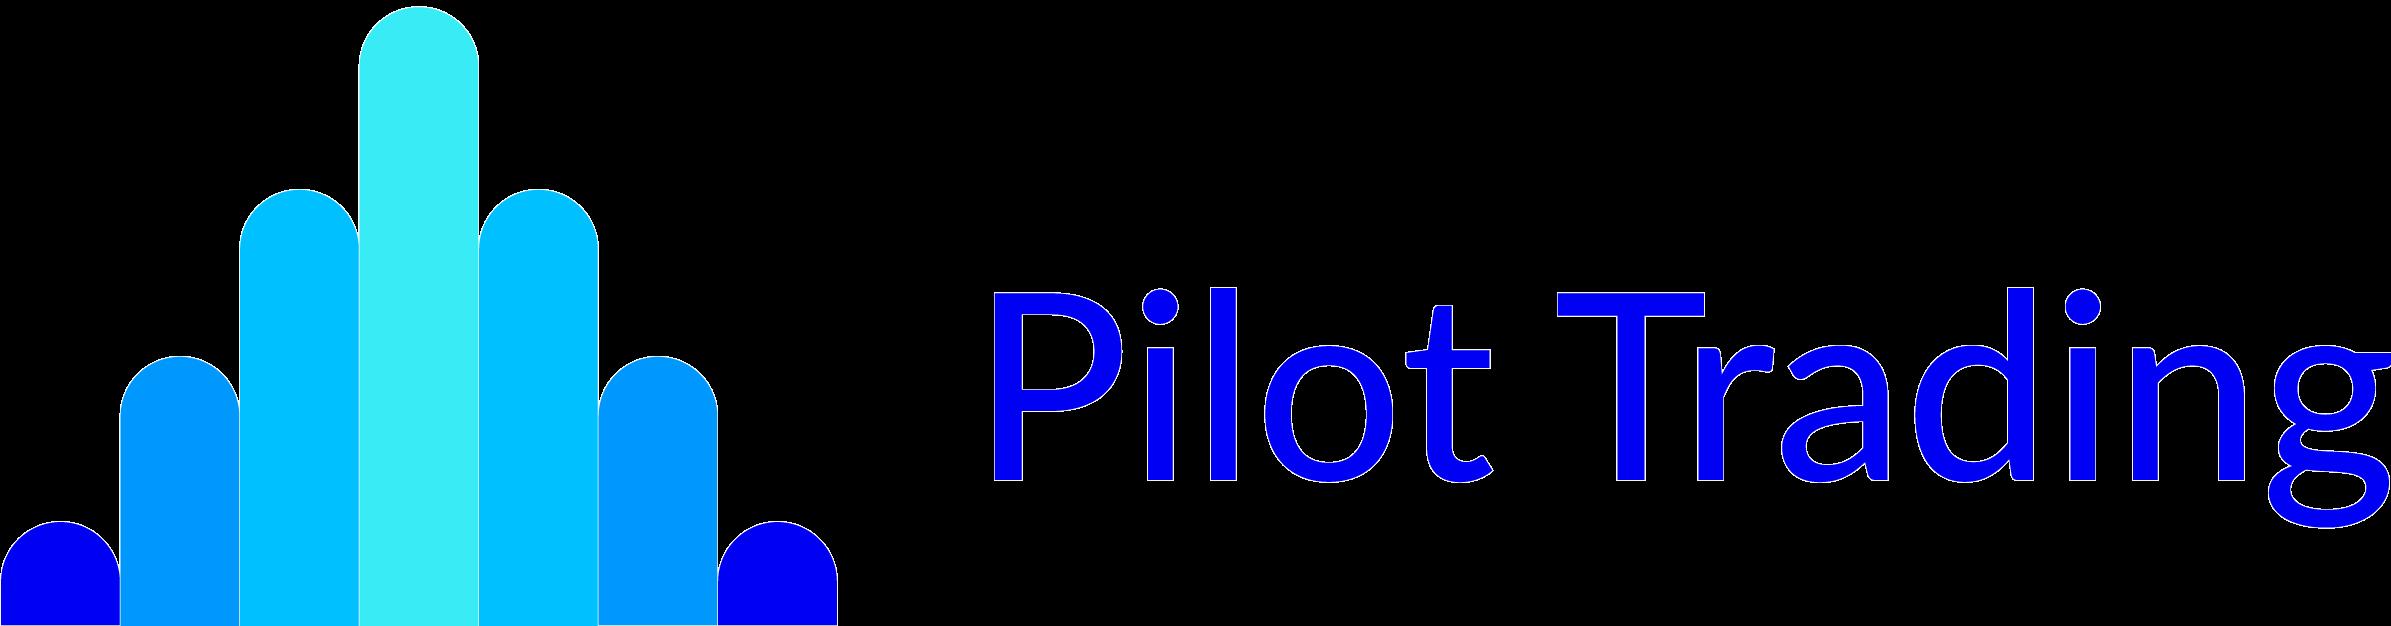 Pilot Trading